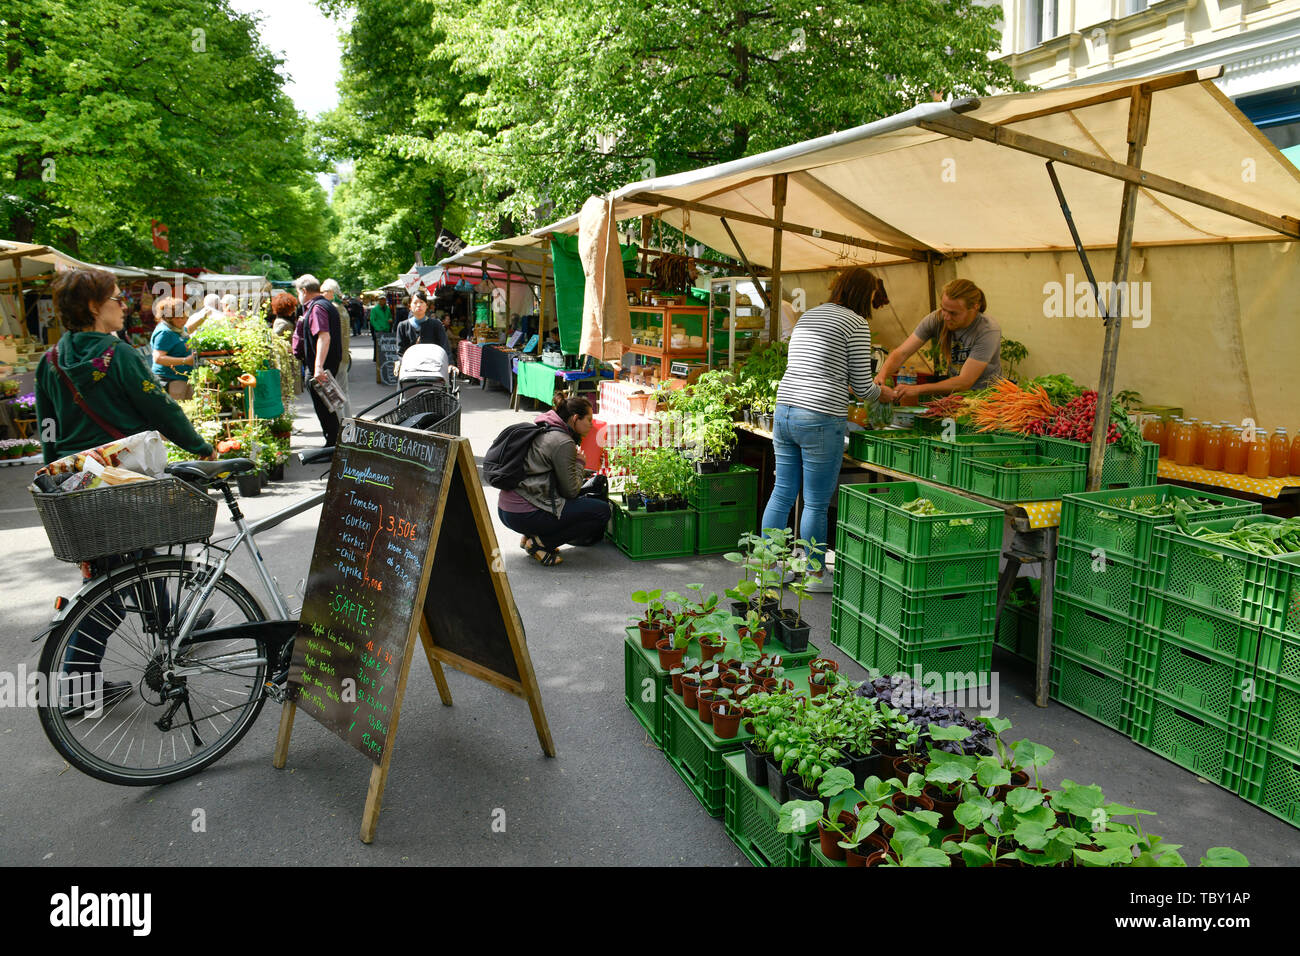 Ecological market, place Kollwitz, Prenzlauer mountain, Pankow, Berlin, Germany, Ökomarkt, Kollwitzplatz, Prenzlauer Berg, Deutschland - Stock Image